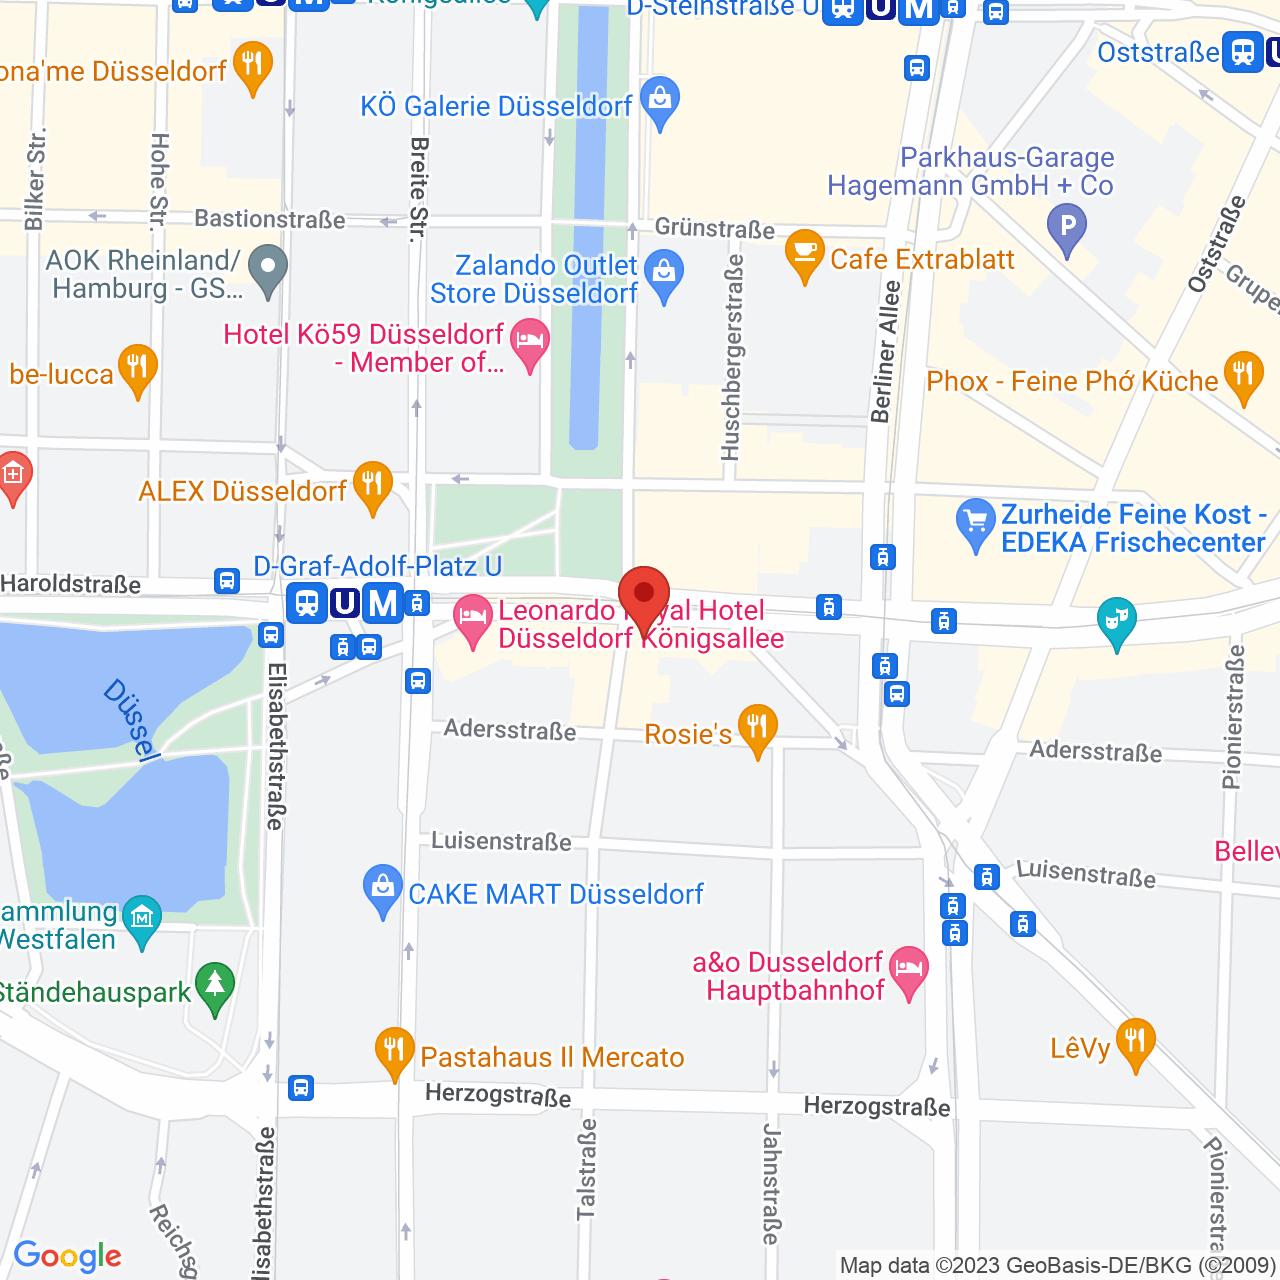 Königsallee 98a, 40215 Düsseldorf, Germany